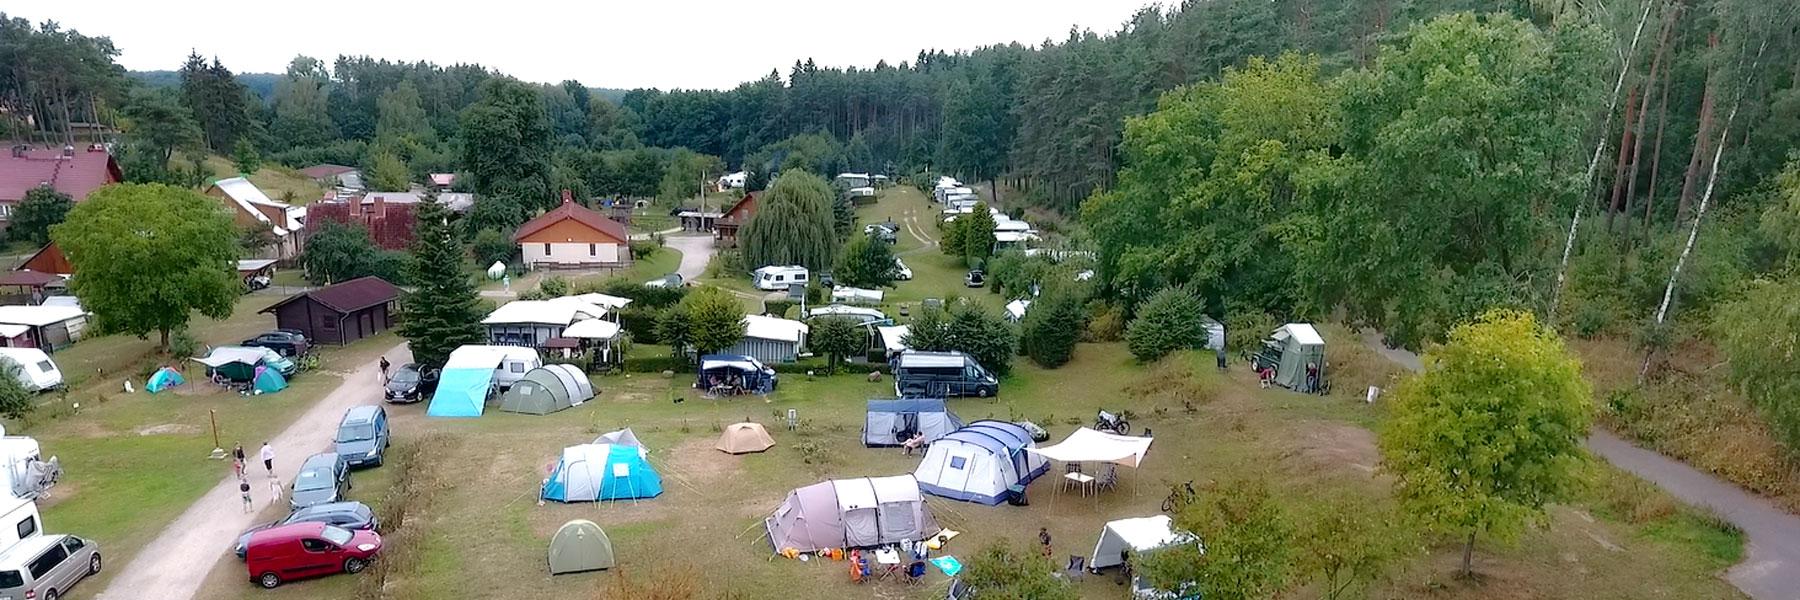 Campingplatz Feldberg - Camping am Bauernhof